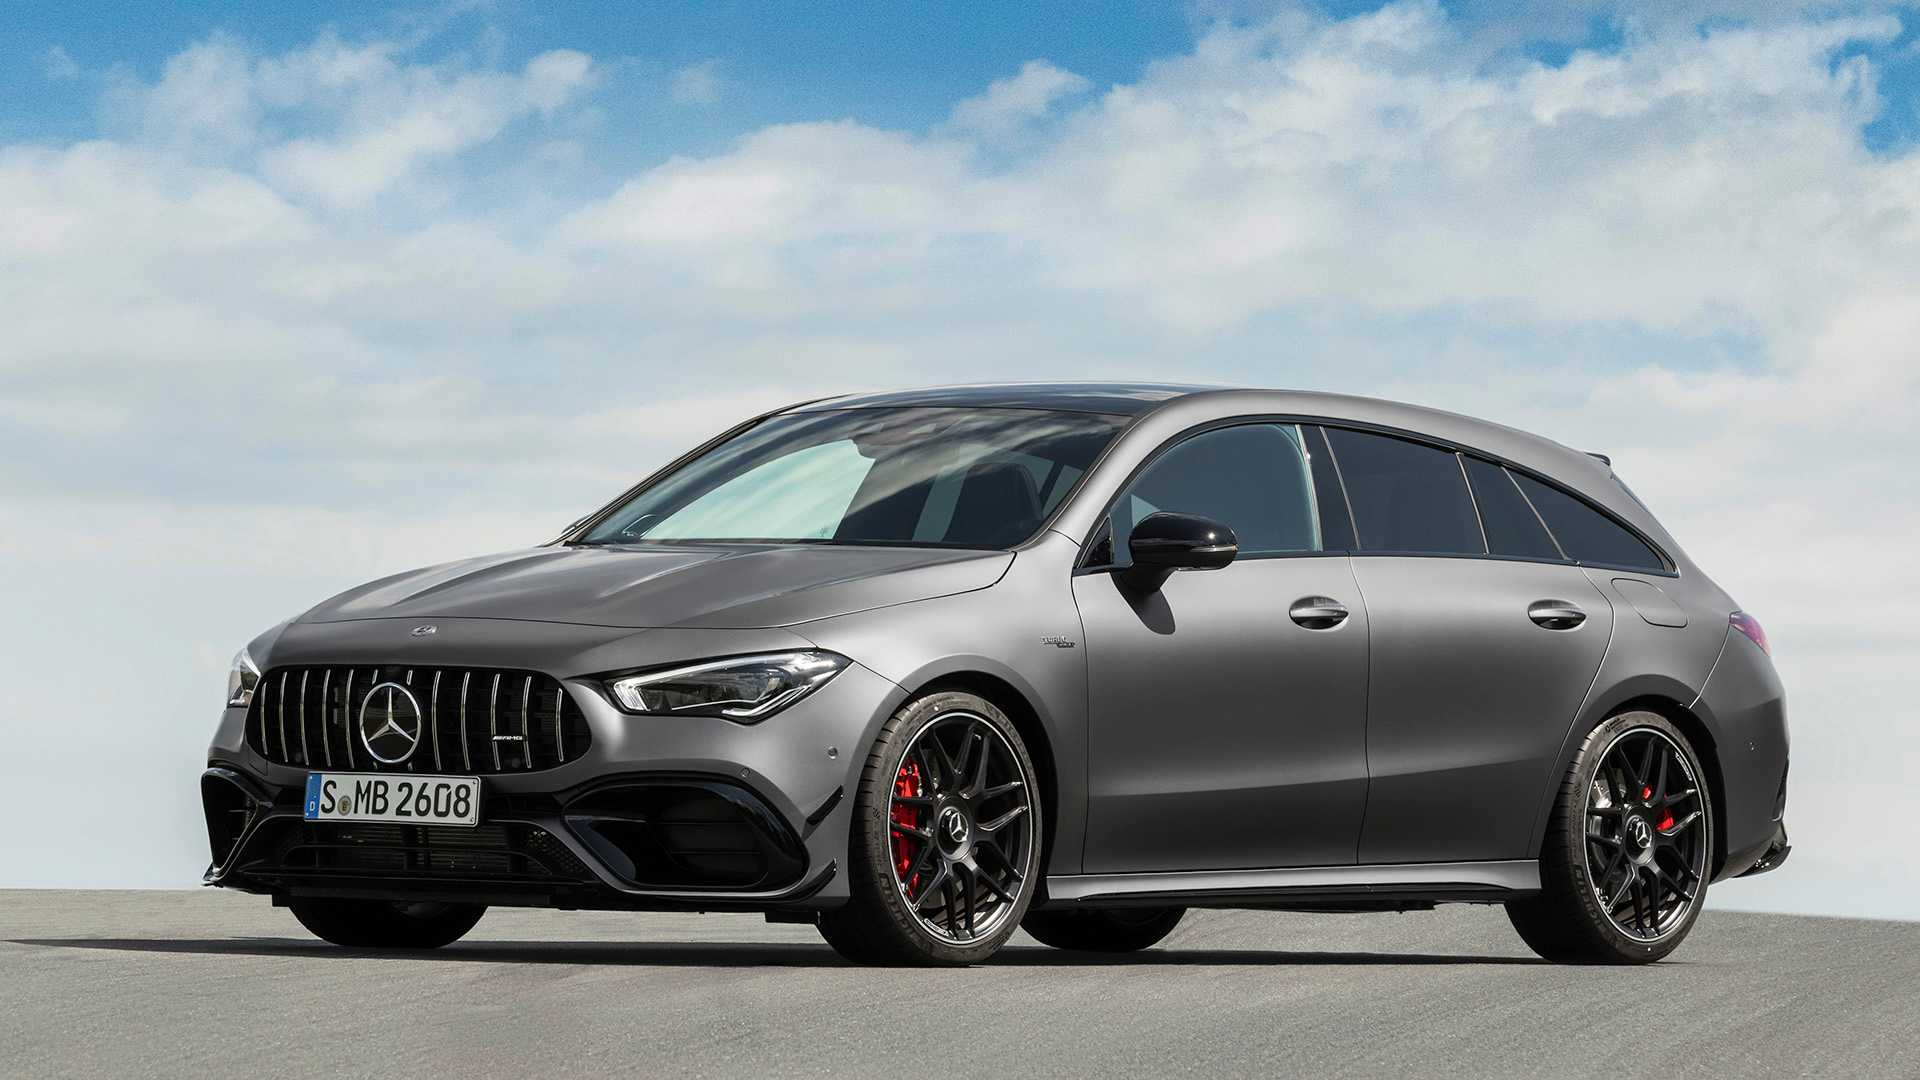 Cla Shooting Brake >> Mercedes Amg Cla 45 Shooting Brake Debuts Its Shapely Long